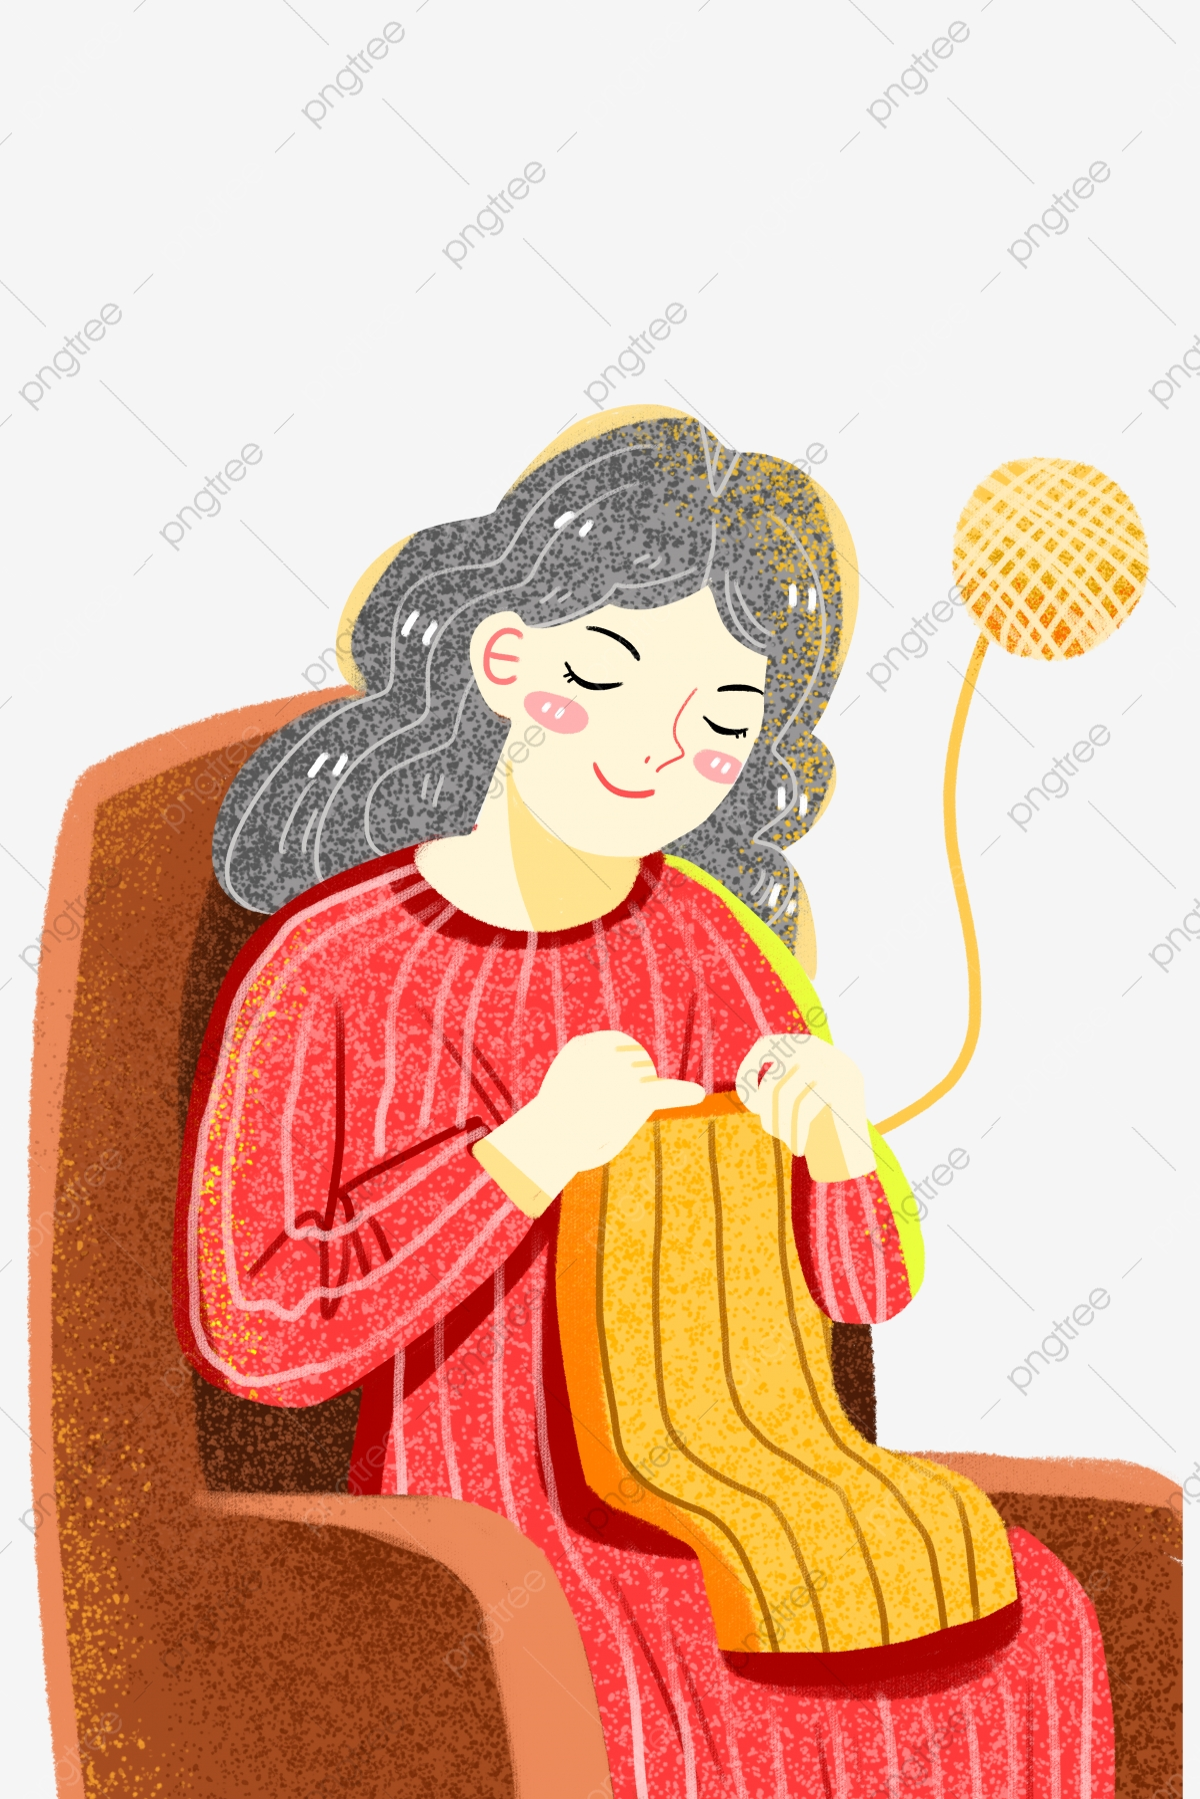 Pin by Wendy Ling on Yarn clipart in 2020 | Knitting yarn, Yarn, Knit art